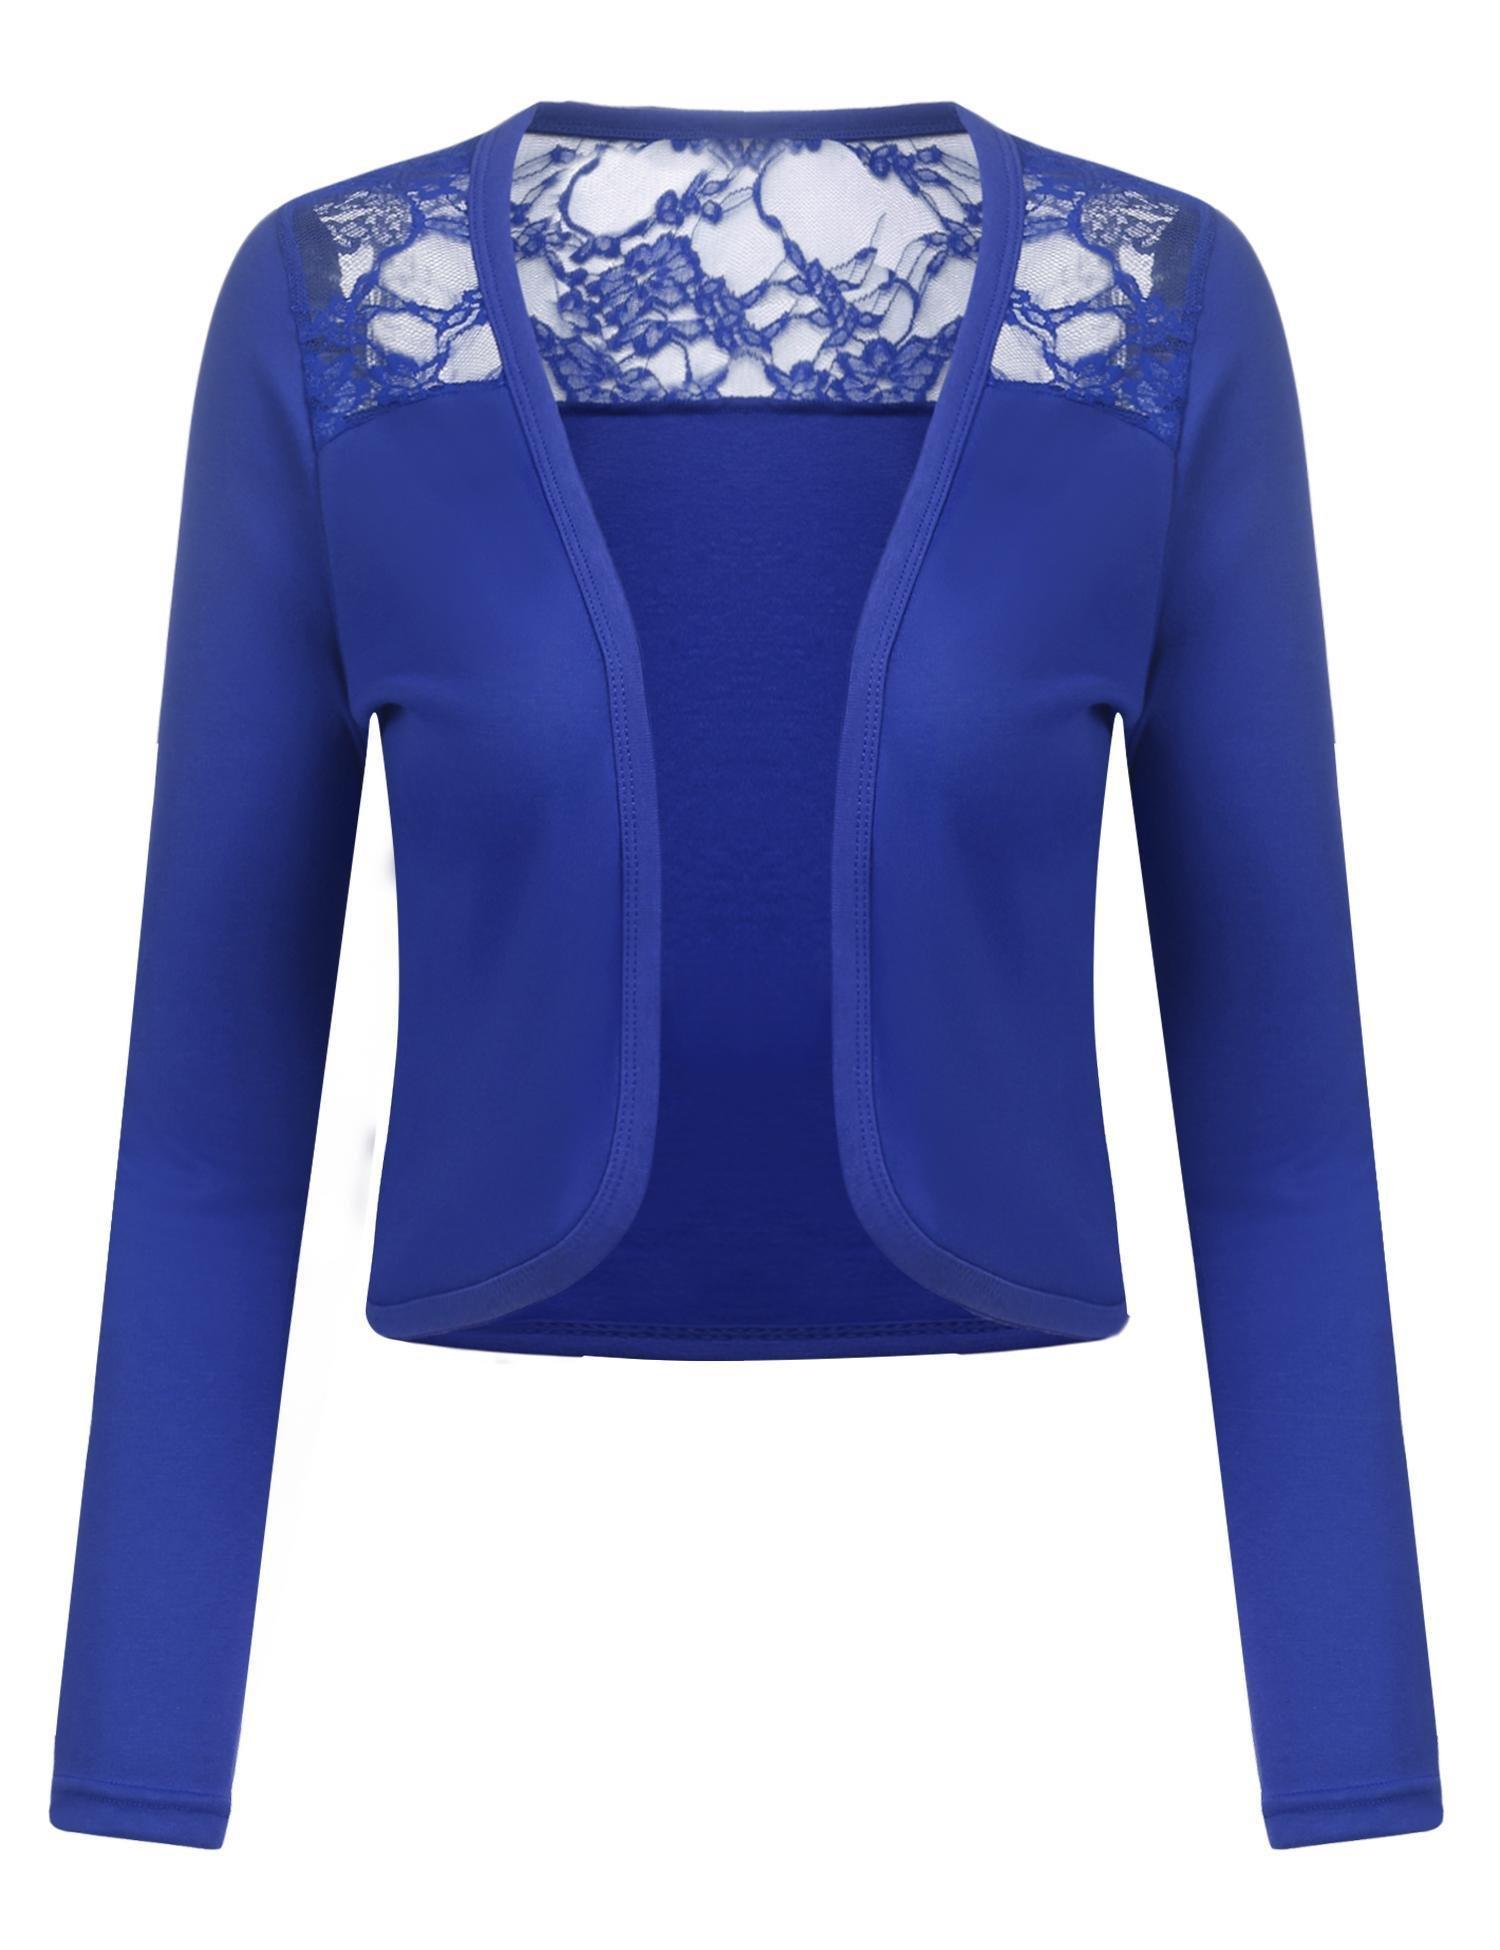 Grabsa Women's Long Sleeve Bolero Shrug Lace Cropped Open Front Cardigan Blazer